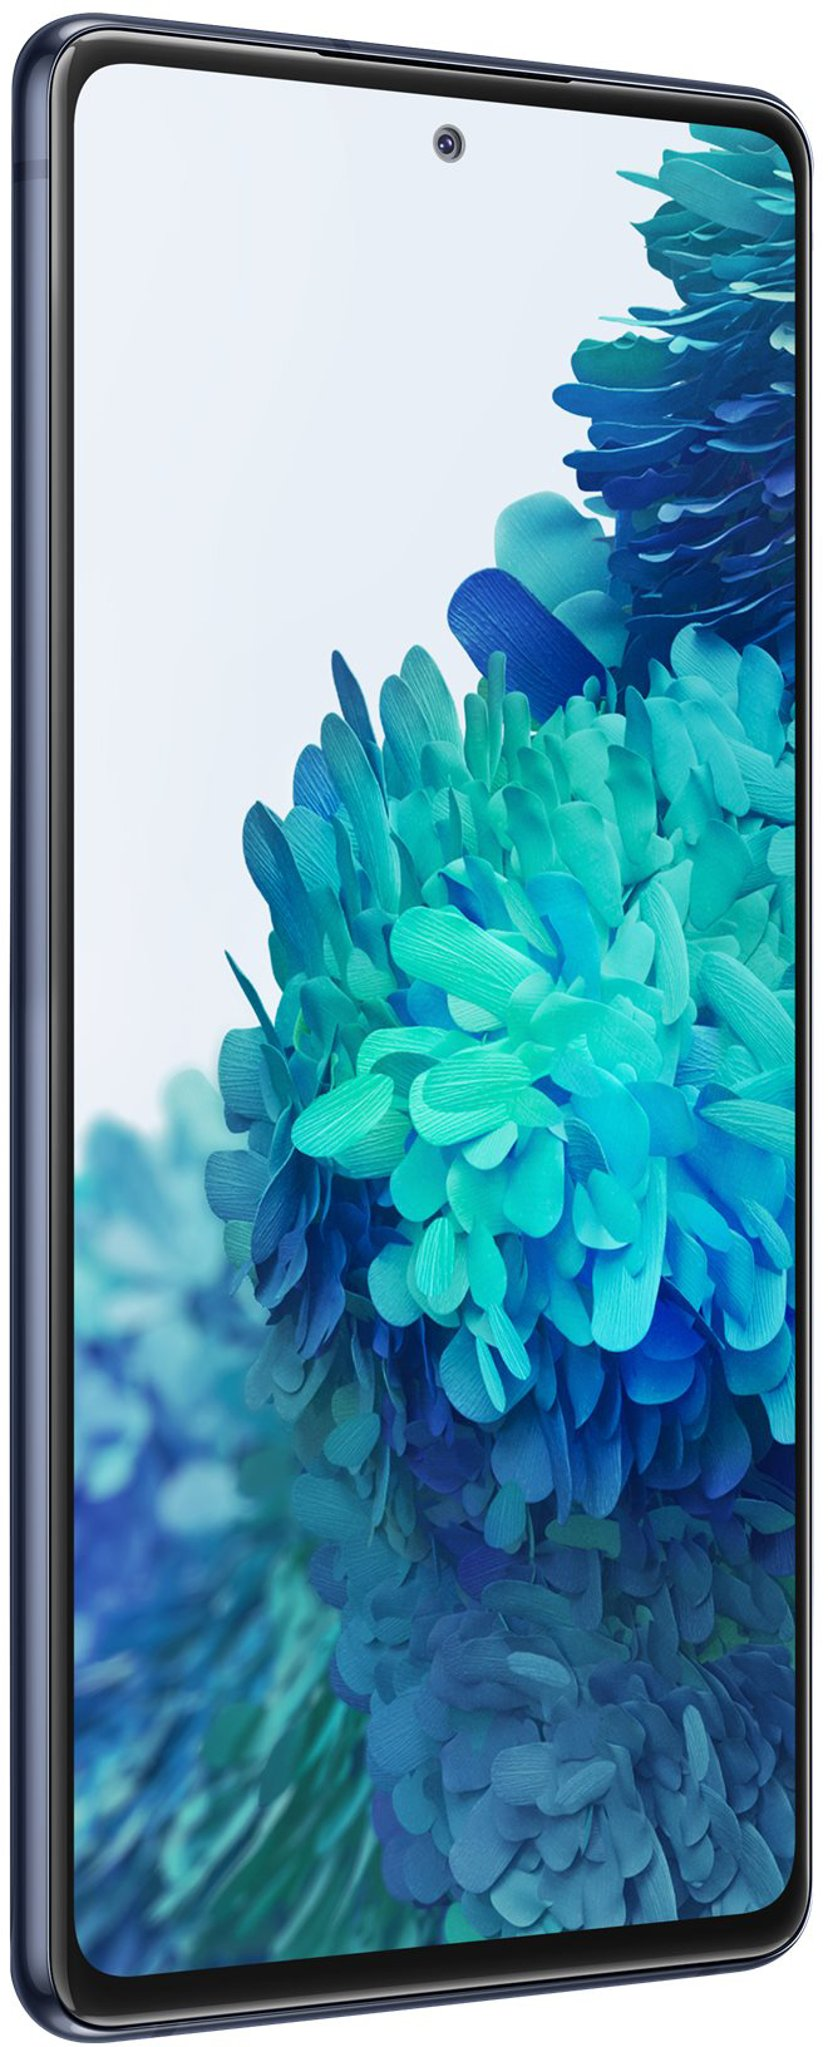 Samsung Galaxy S20 FE 4G 128GB Dual-SIM Marinblått moln